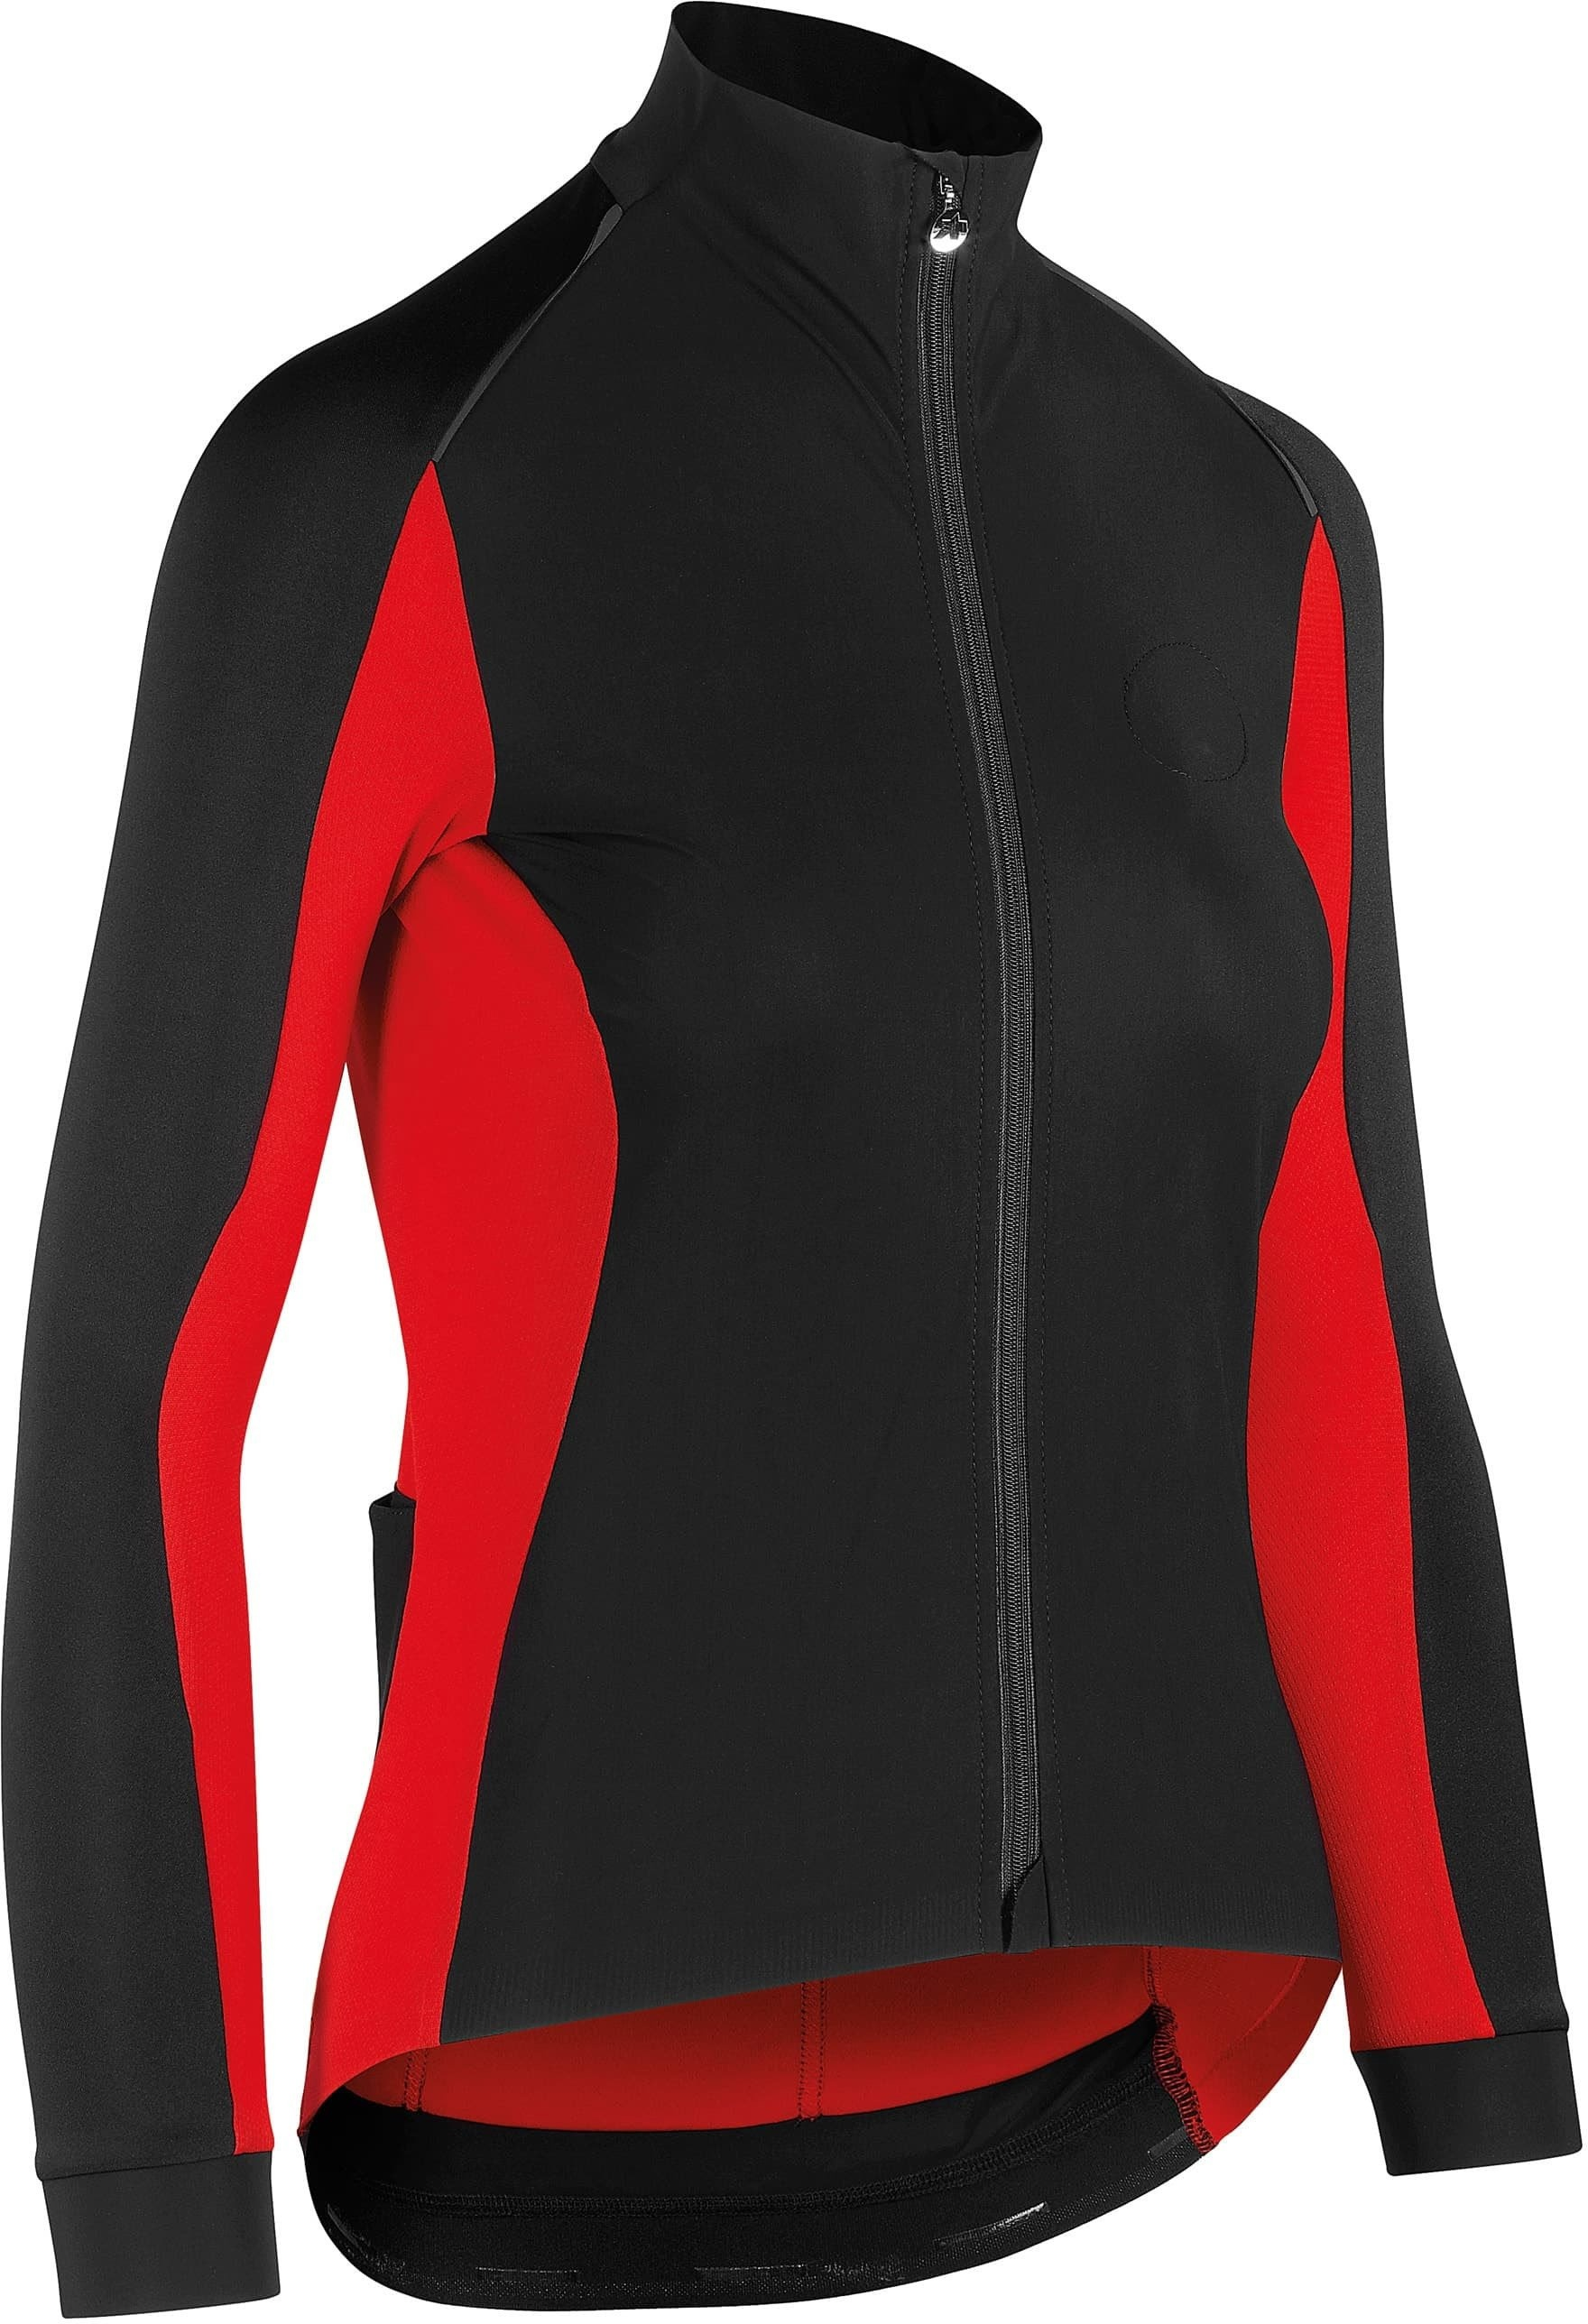 Assos Jakke Tiburu Laalalai Women's Jacket - sort/rød